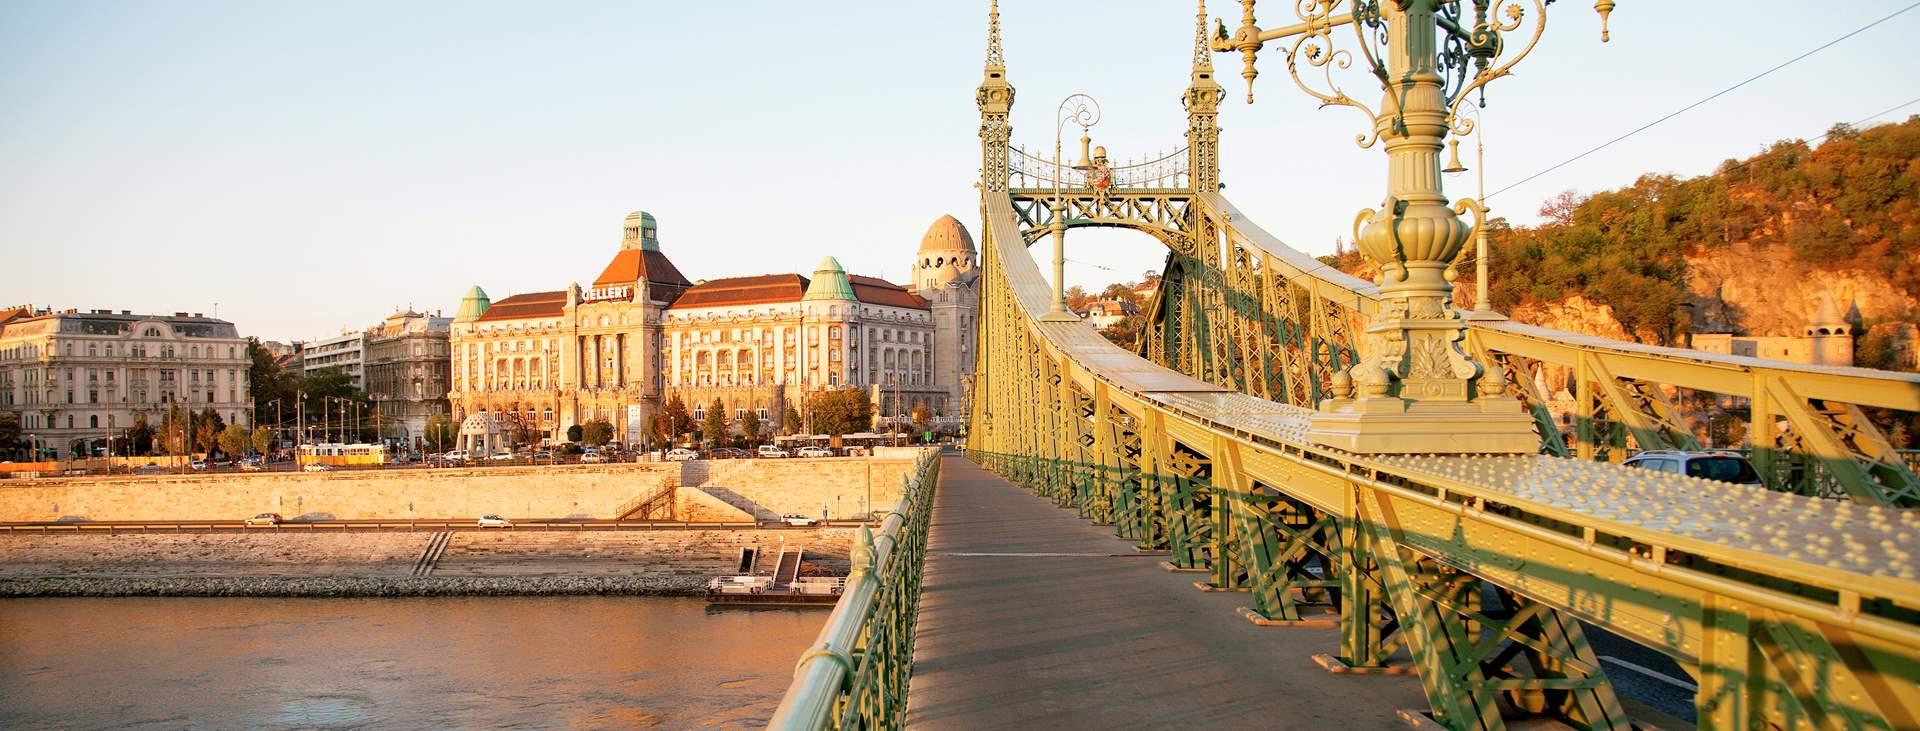 Budapestin matkat